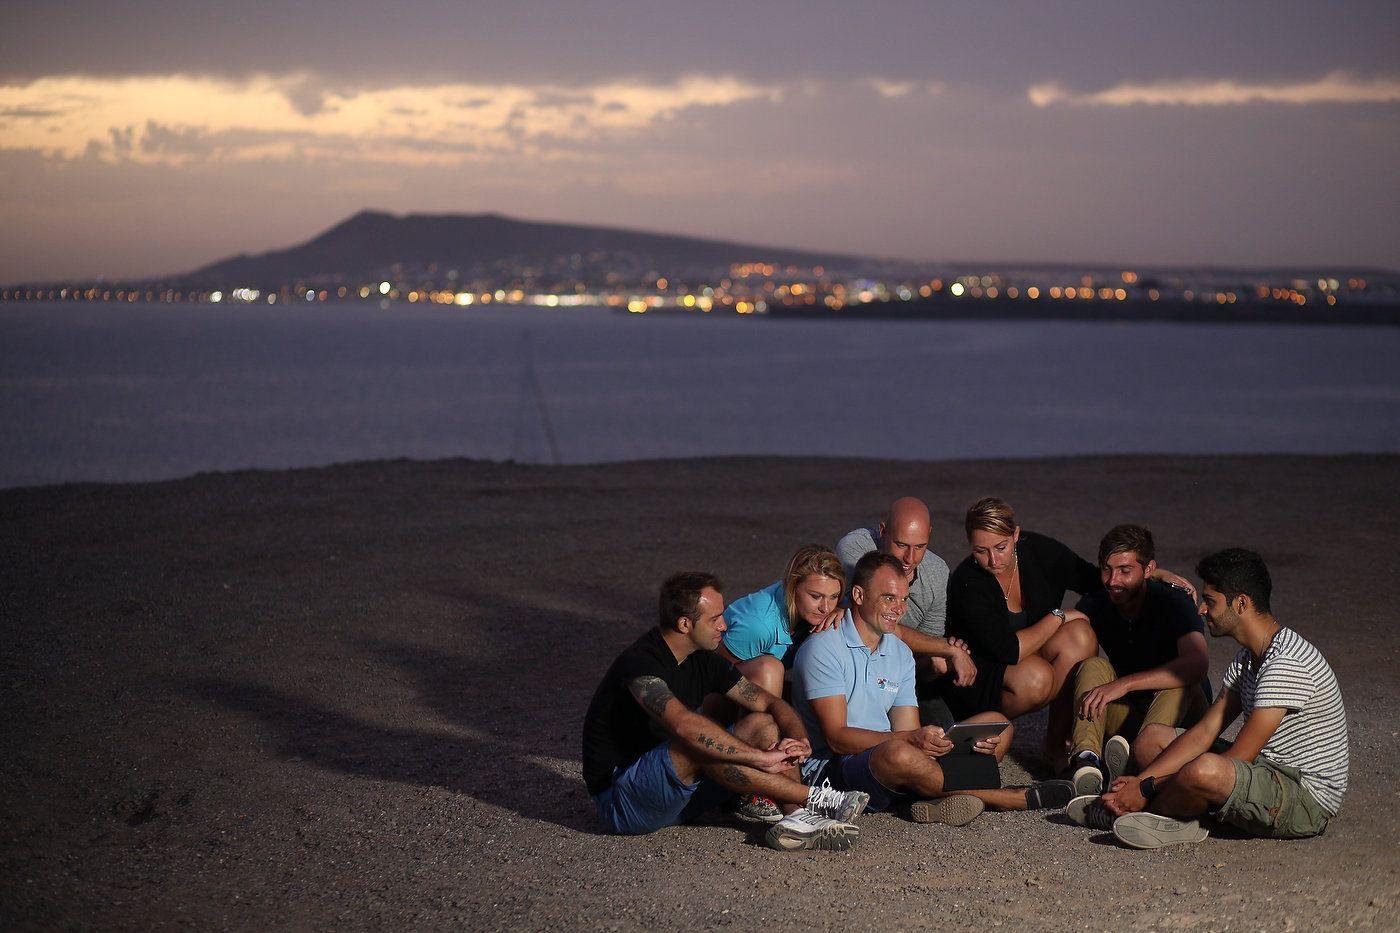 Workshop de fotografie cu Dan Malureanu in Lanzarote